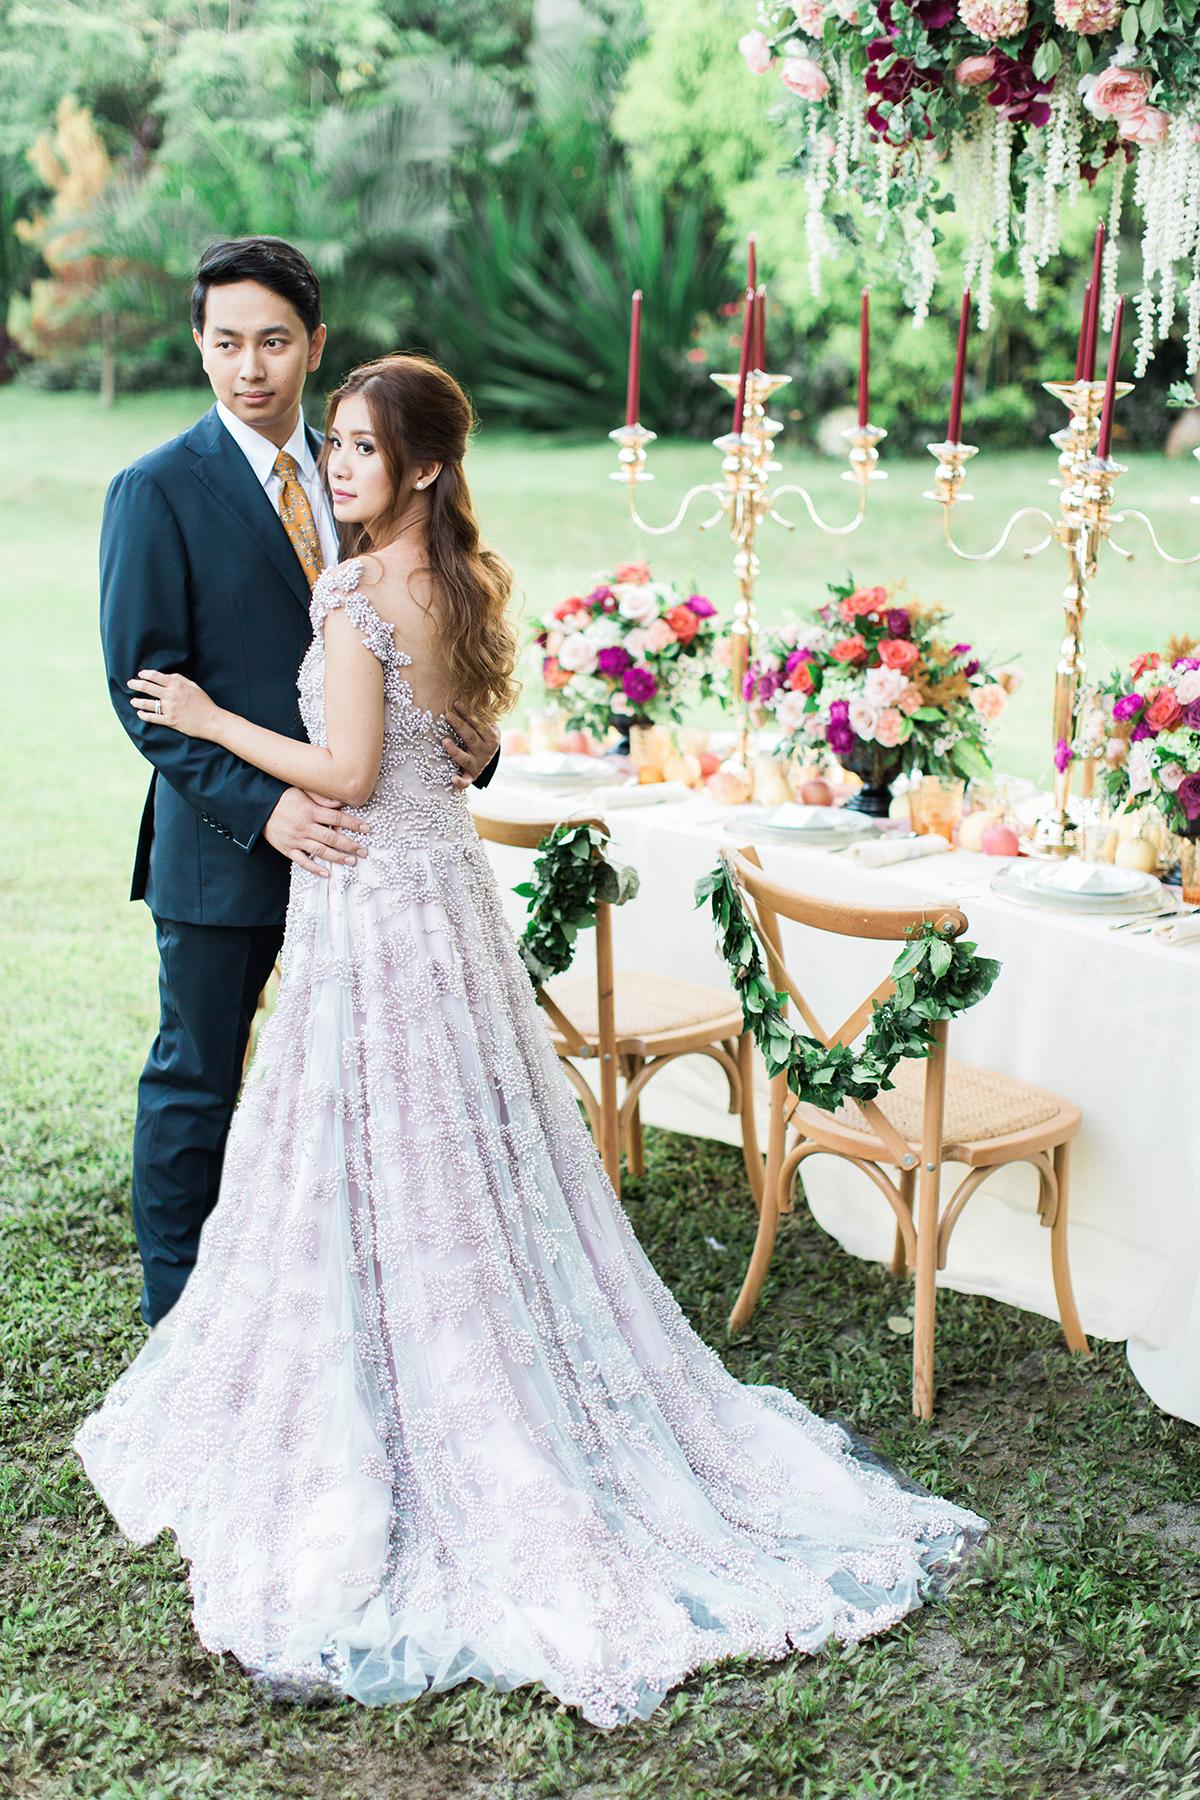 philippine wedding photographer 1jpg